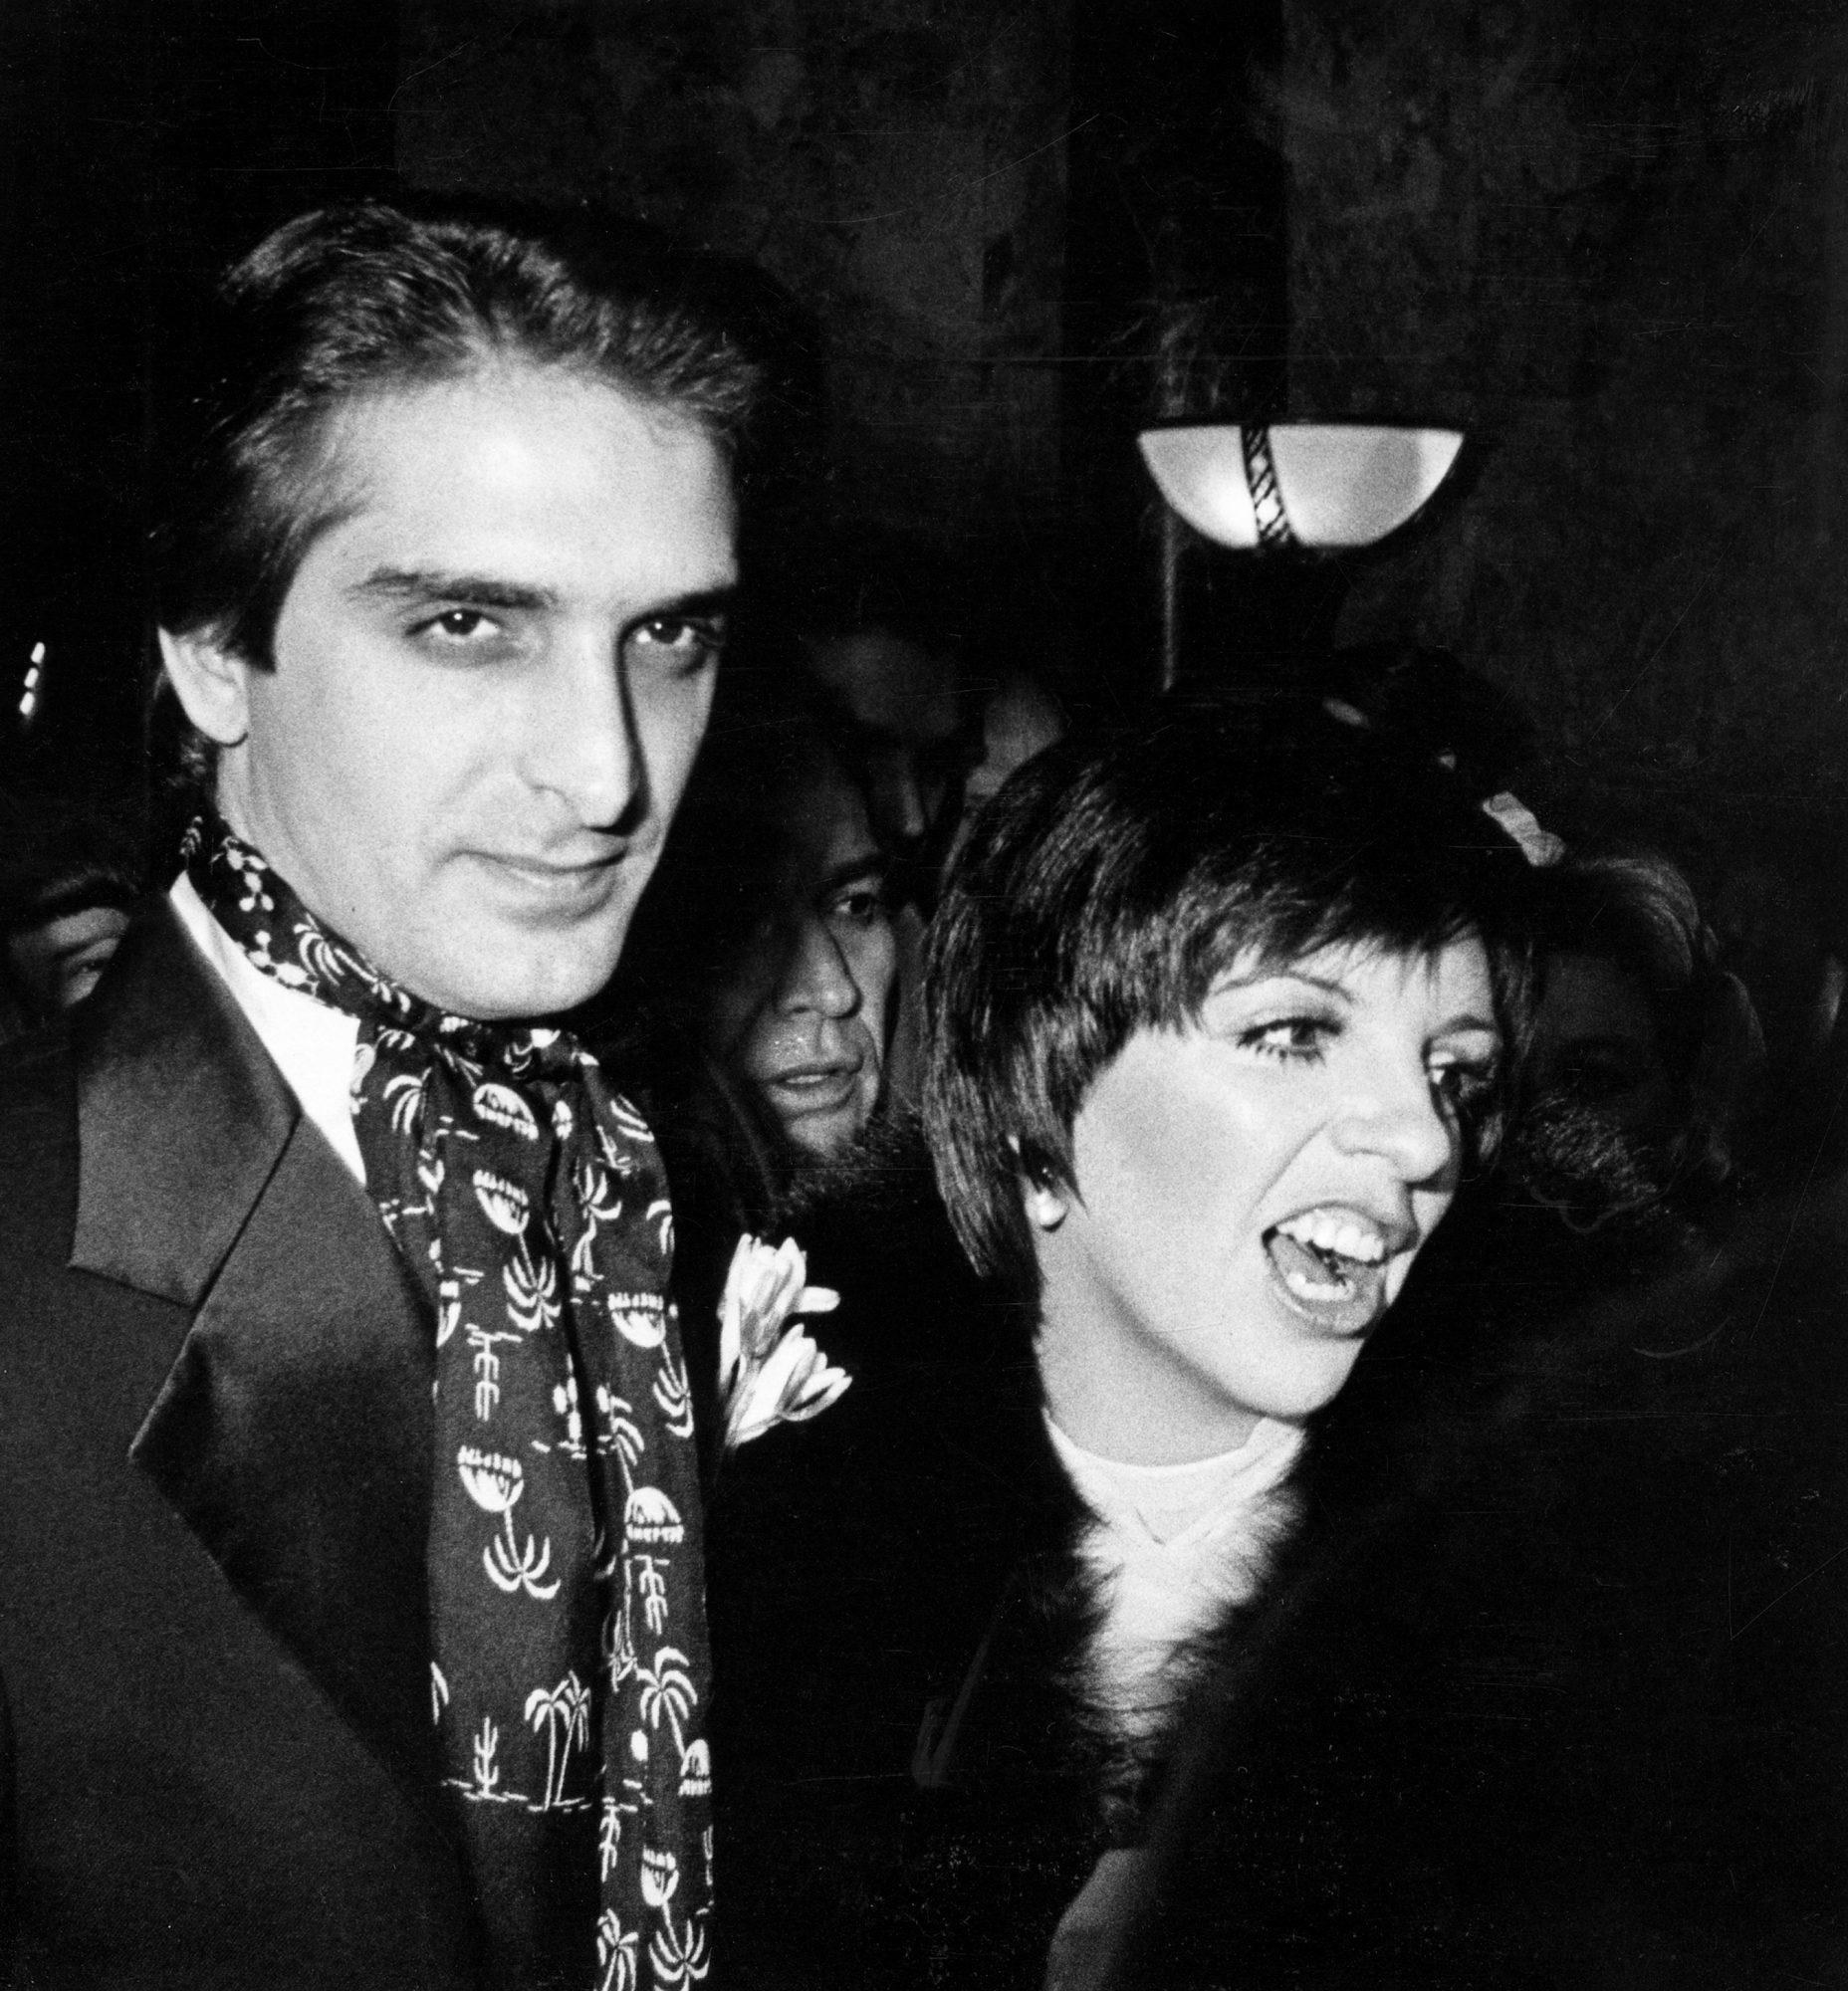 Liza Minnelli and Mark Gero Wedding - December 4, 1979